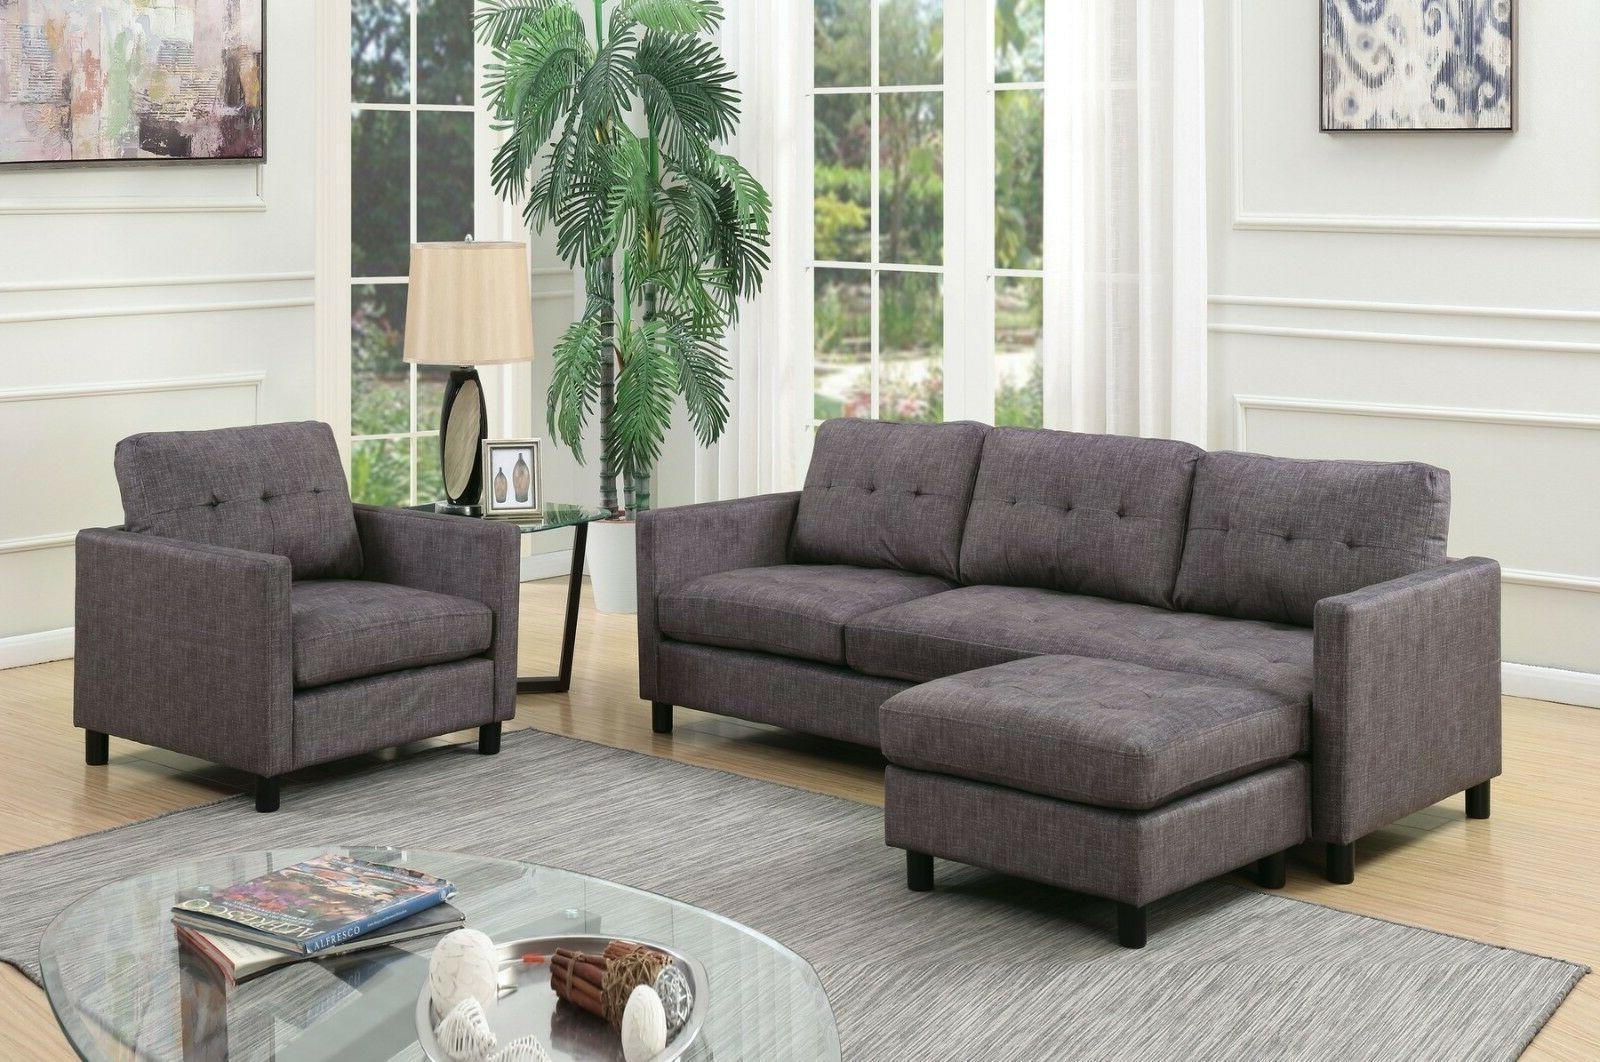 sofa w ottoman chair modern style living